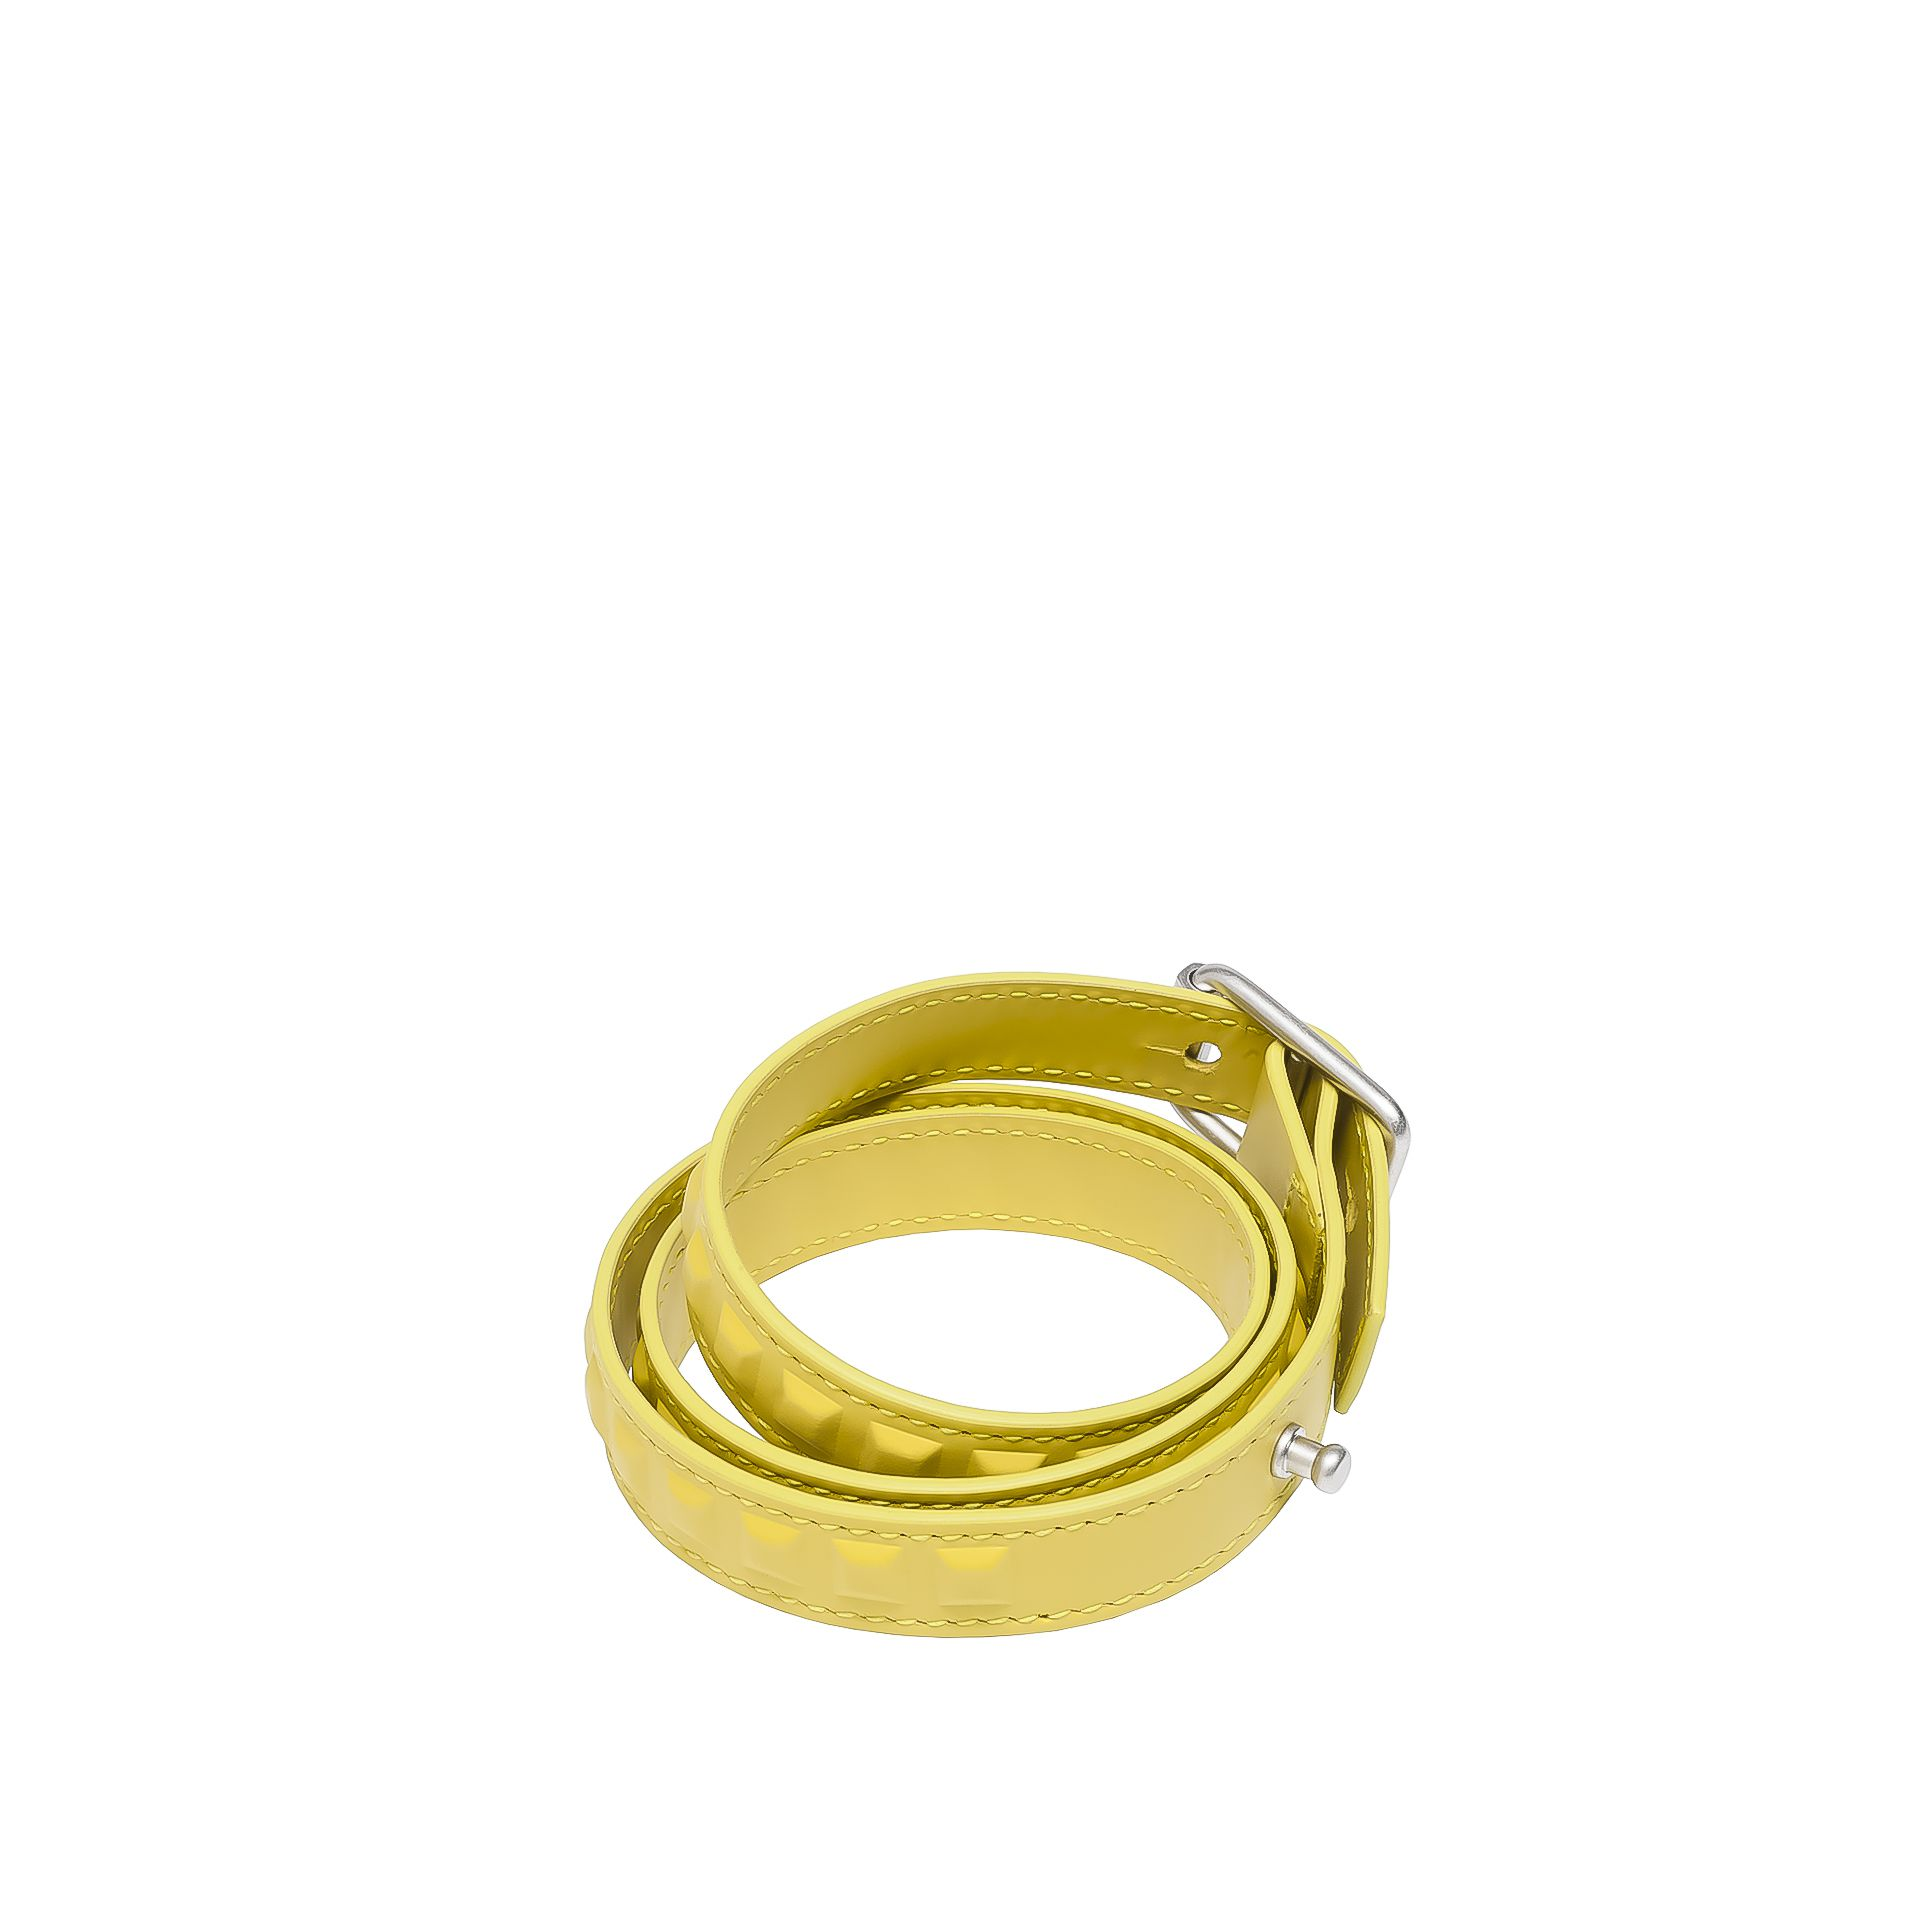 BALENCIAGA Balenciaga Embossed Bracelet Triple Tour Bracelet U f